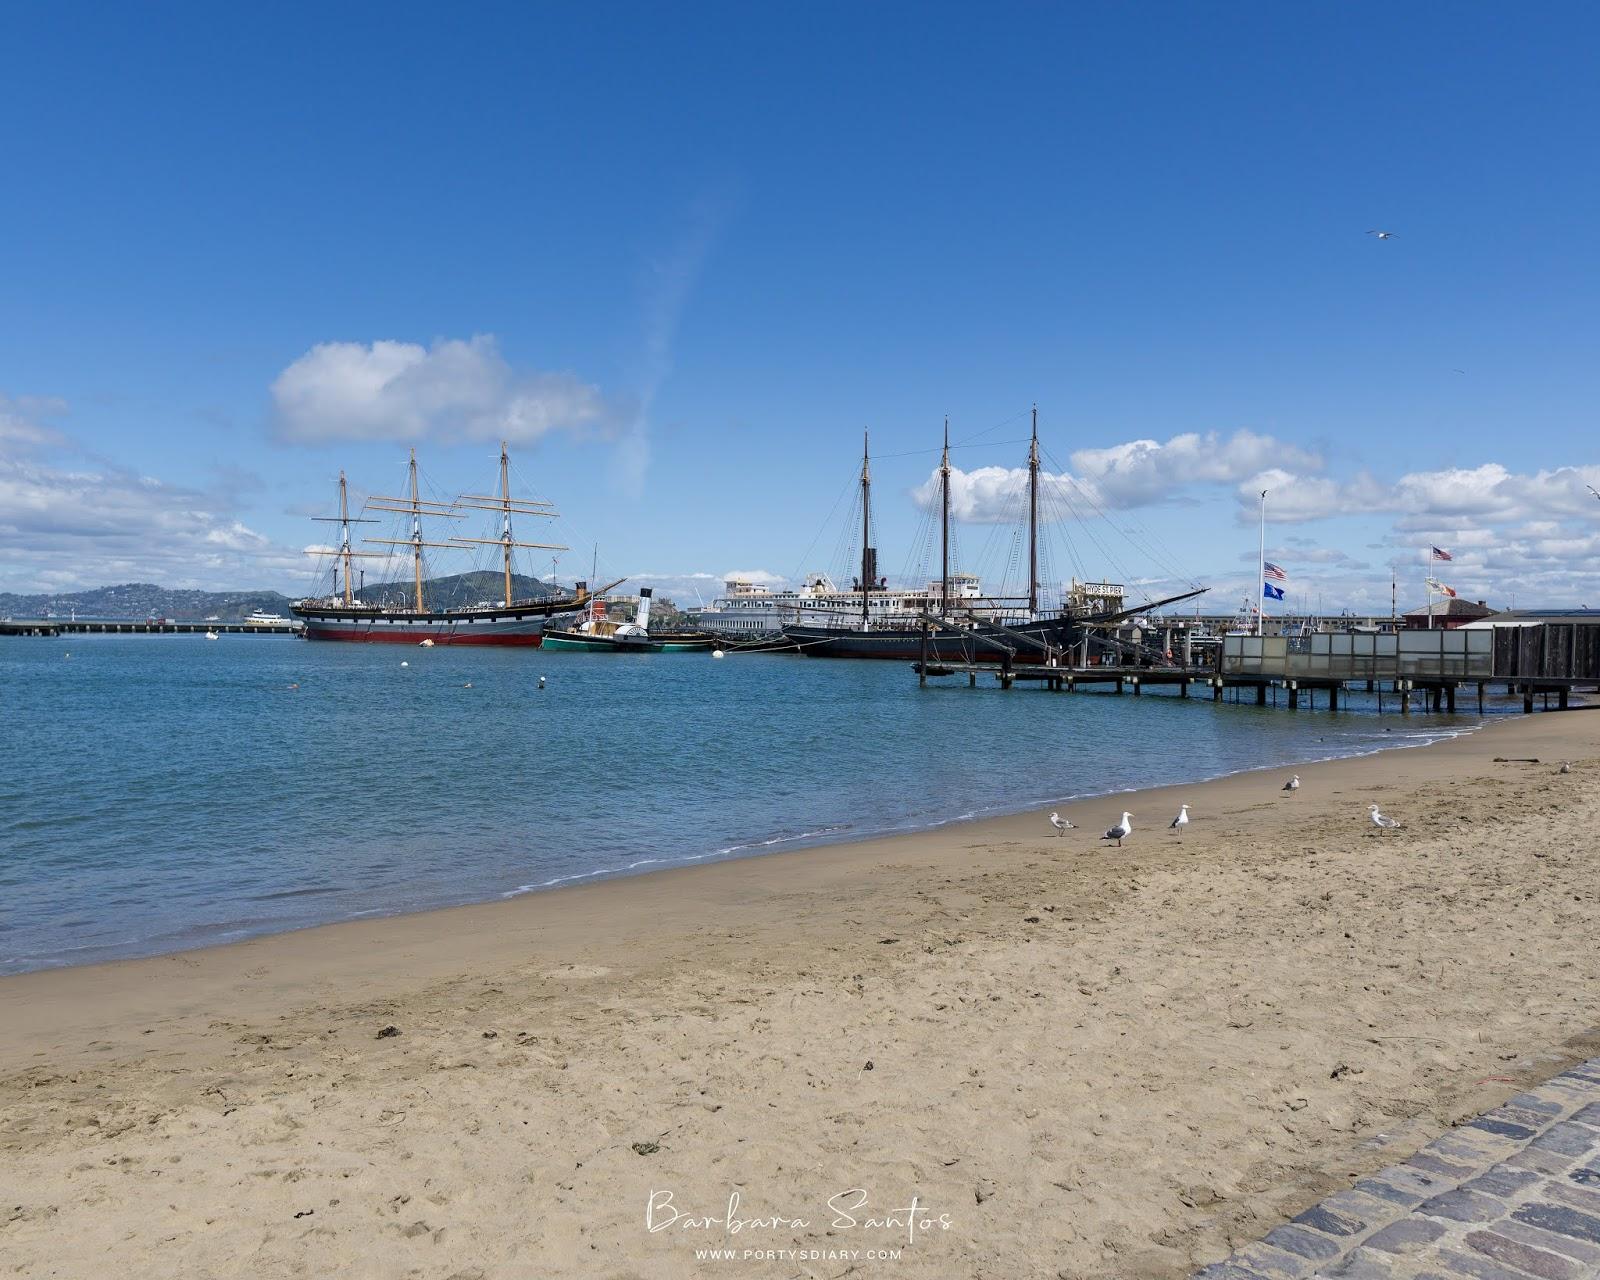 Beach at Maritime National Historical Park - Travel - A week in San Francisco.